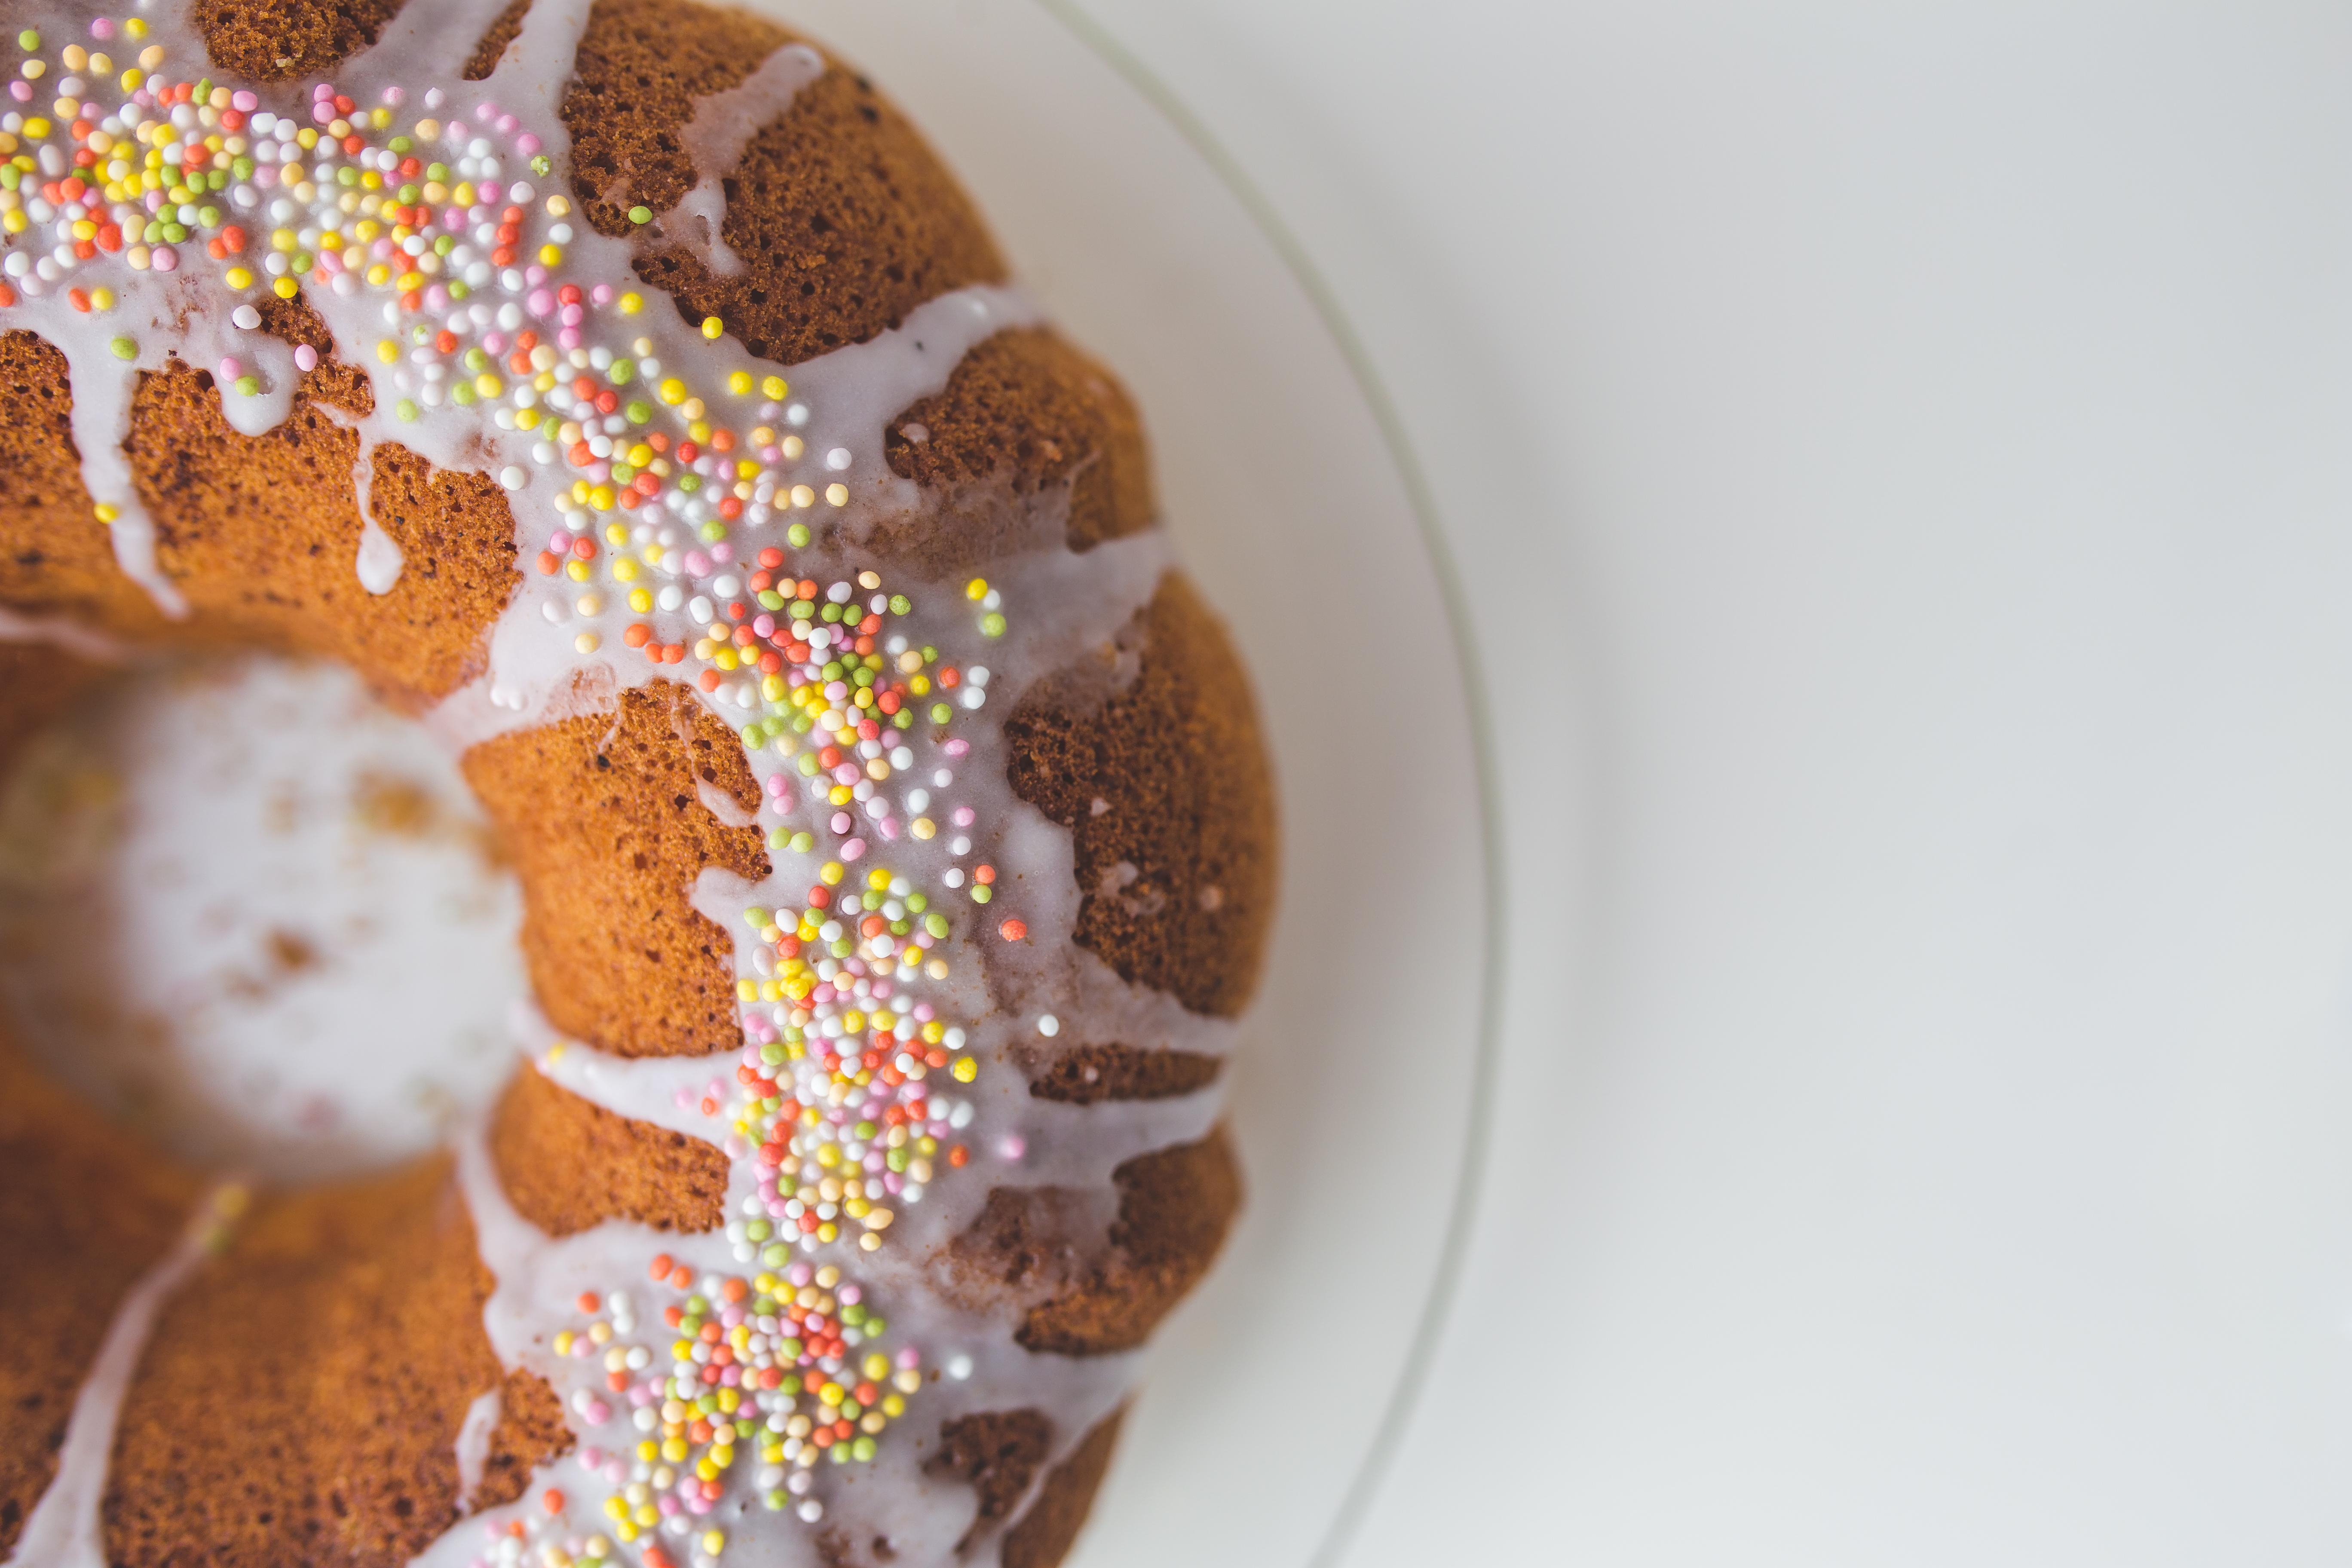 food-sweet-cake-glace-icing.jpg (5472×3648)